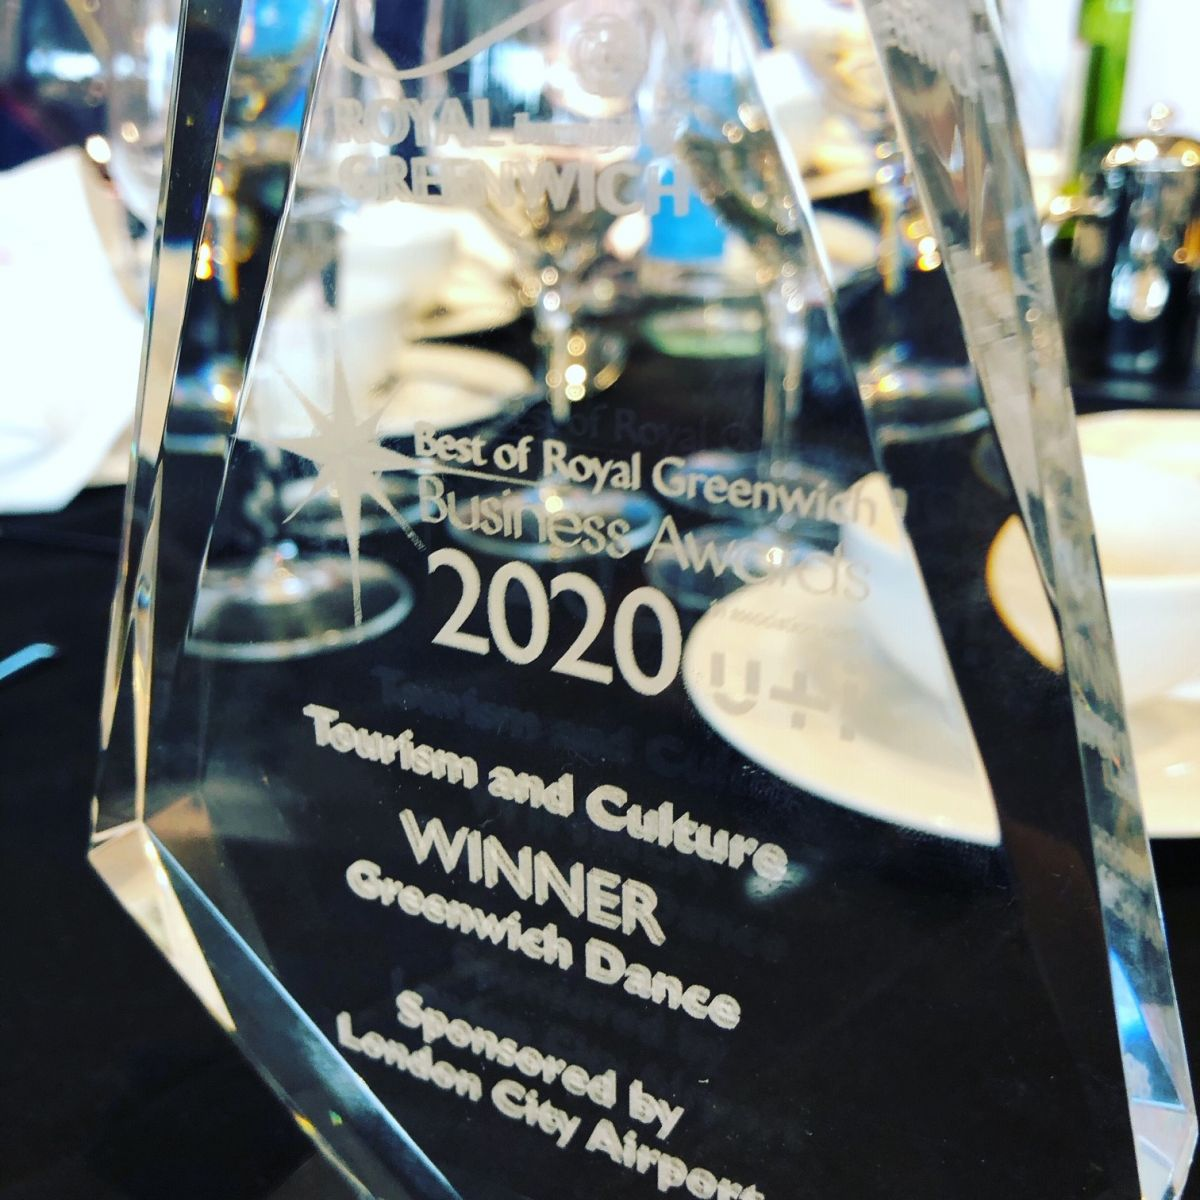 Close up of award